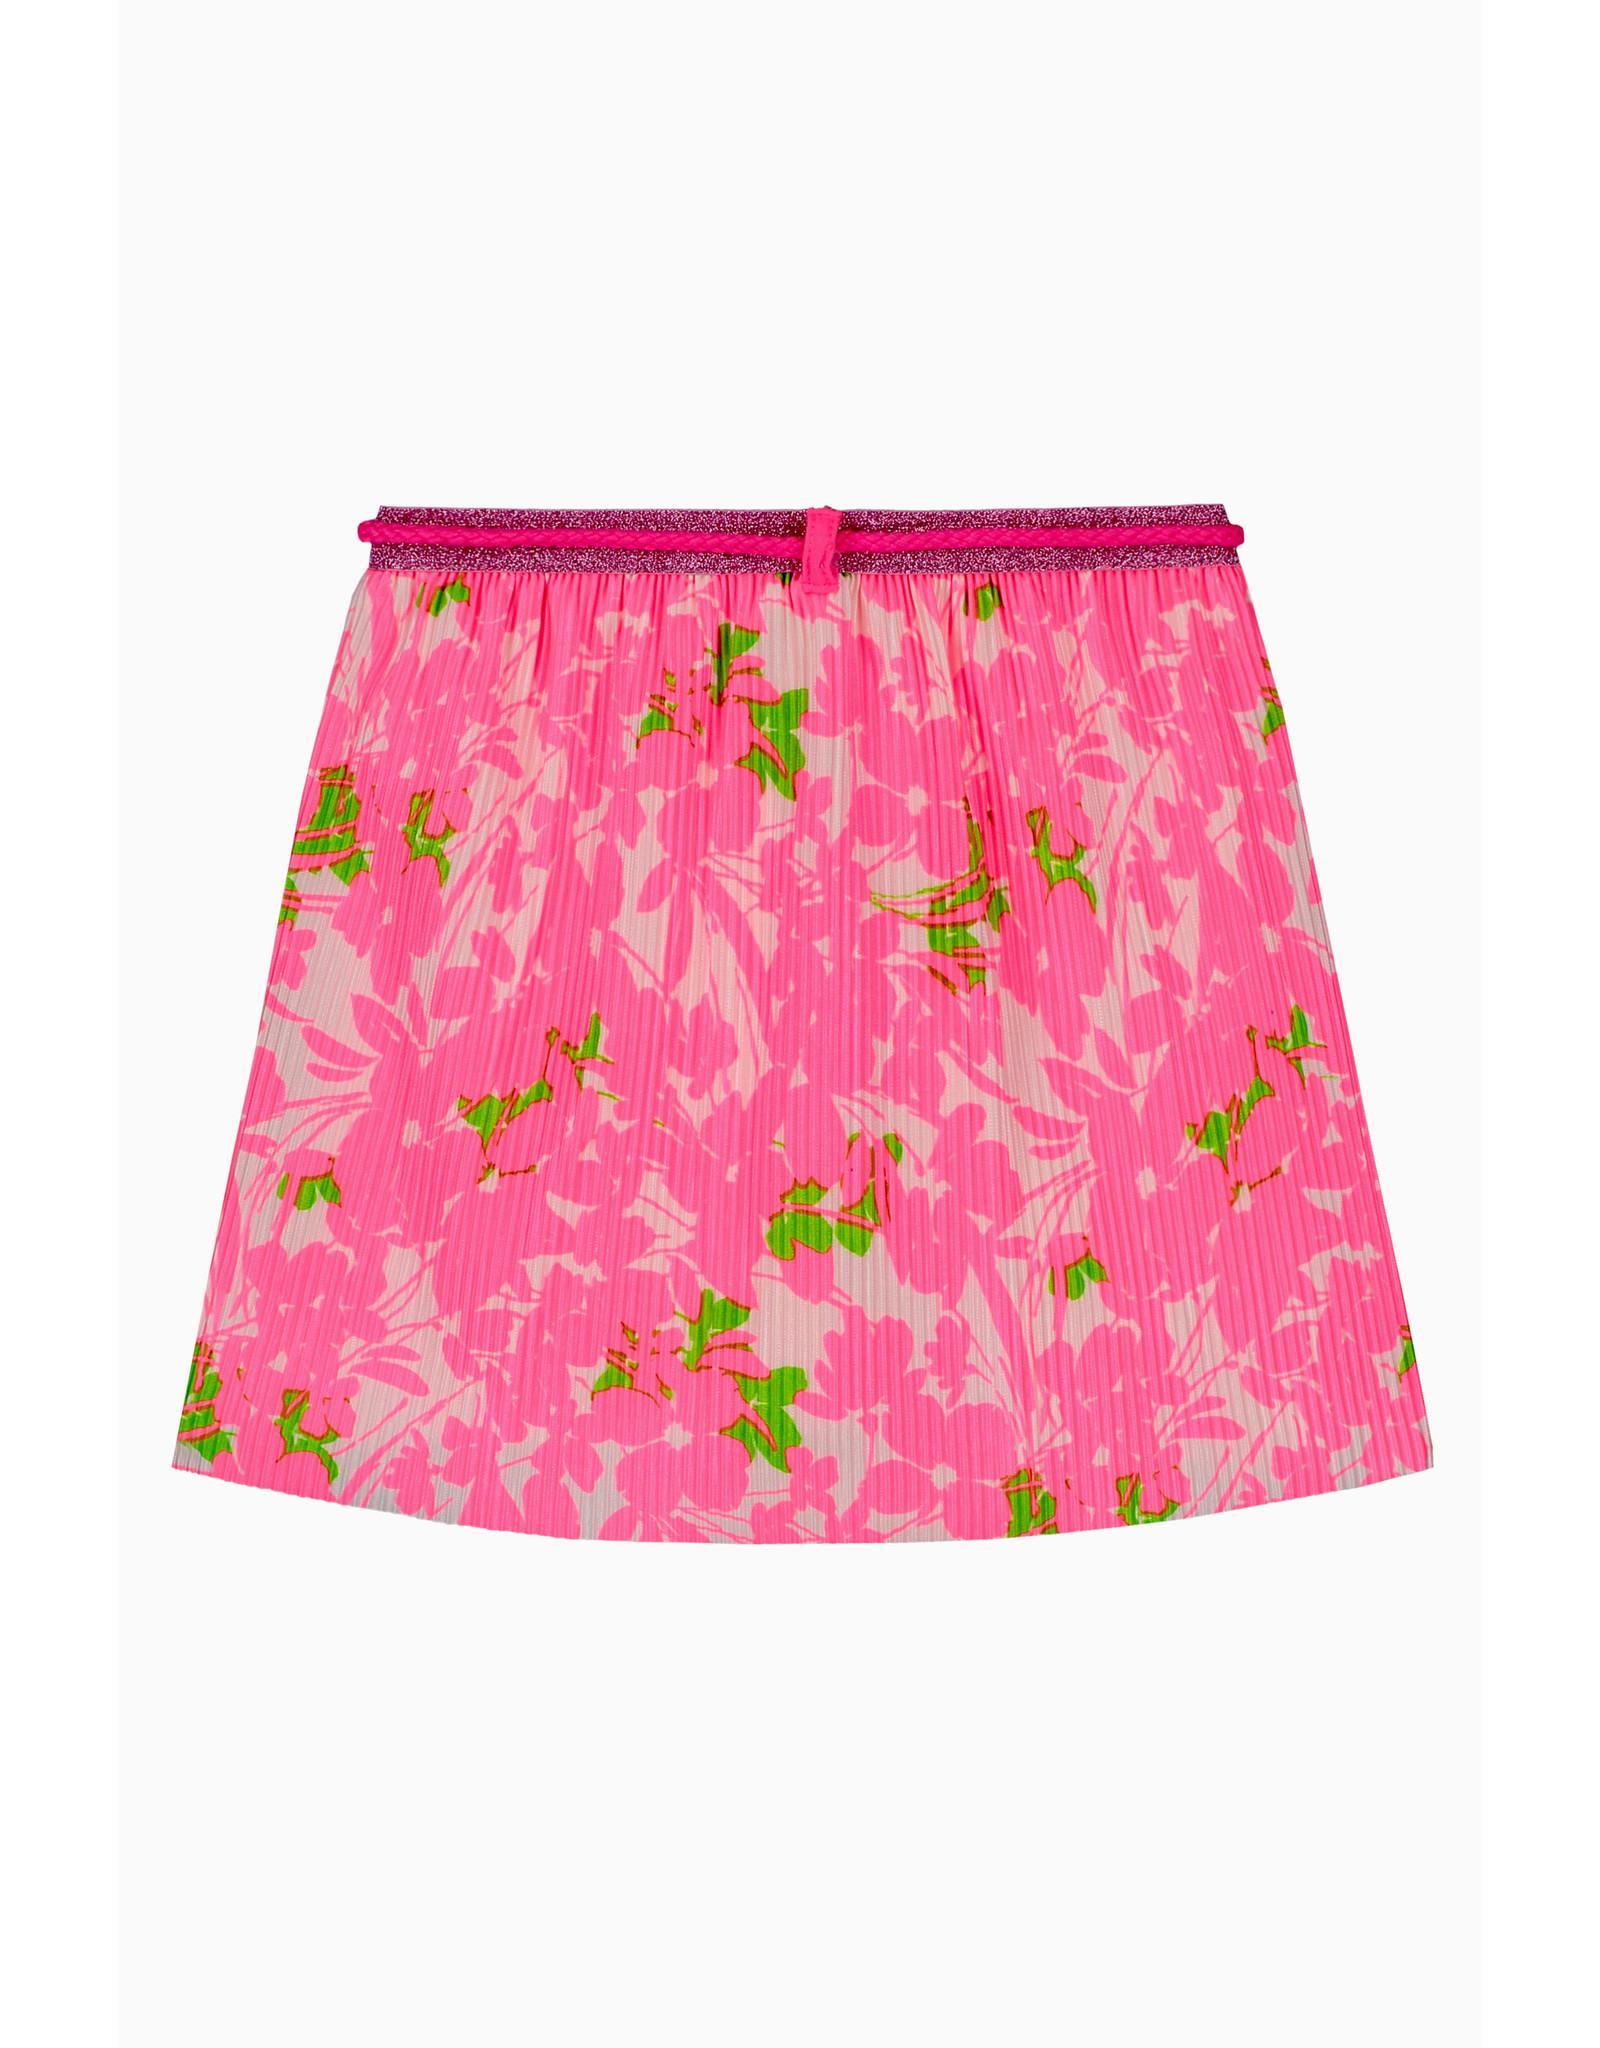 Quapi Aylien Neon pink